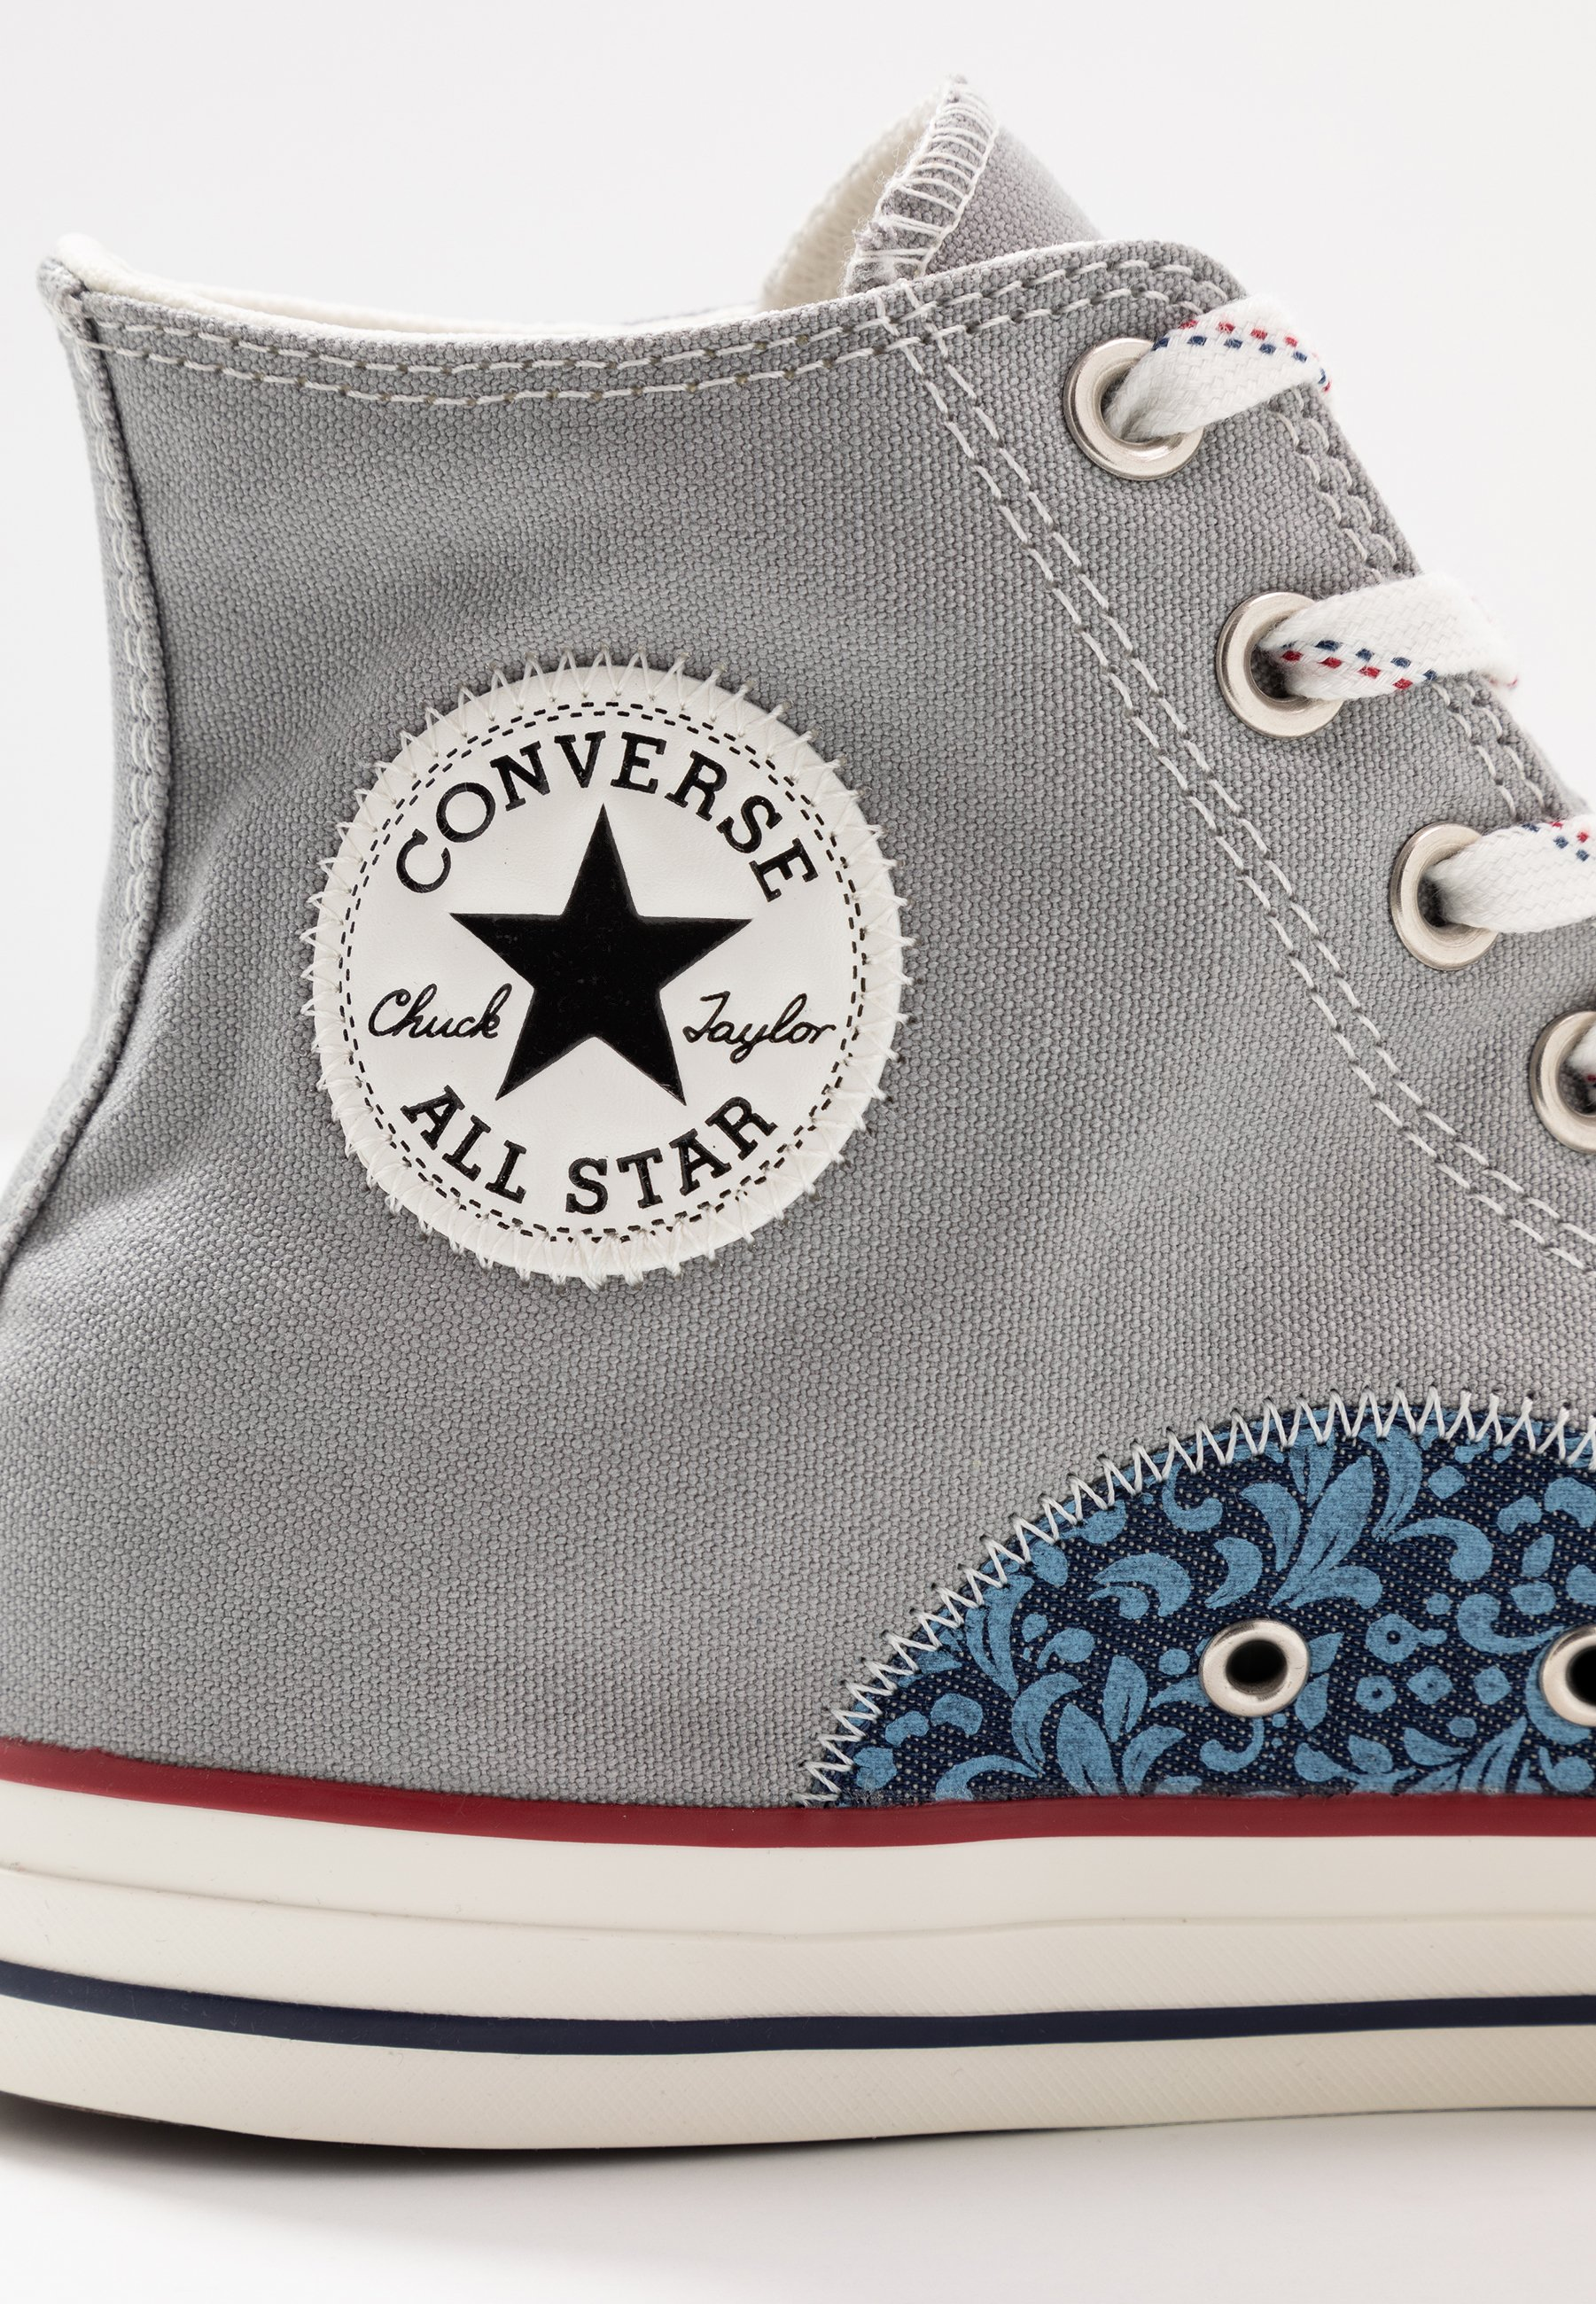 Converse CHUCK TAYLOR ALL STAR Joggesko dolphinobsidian